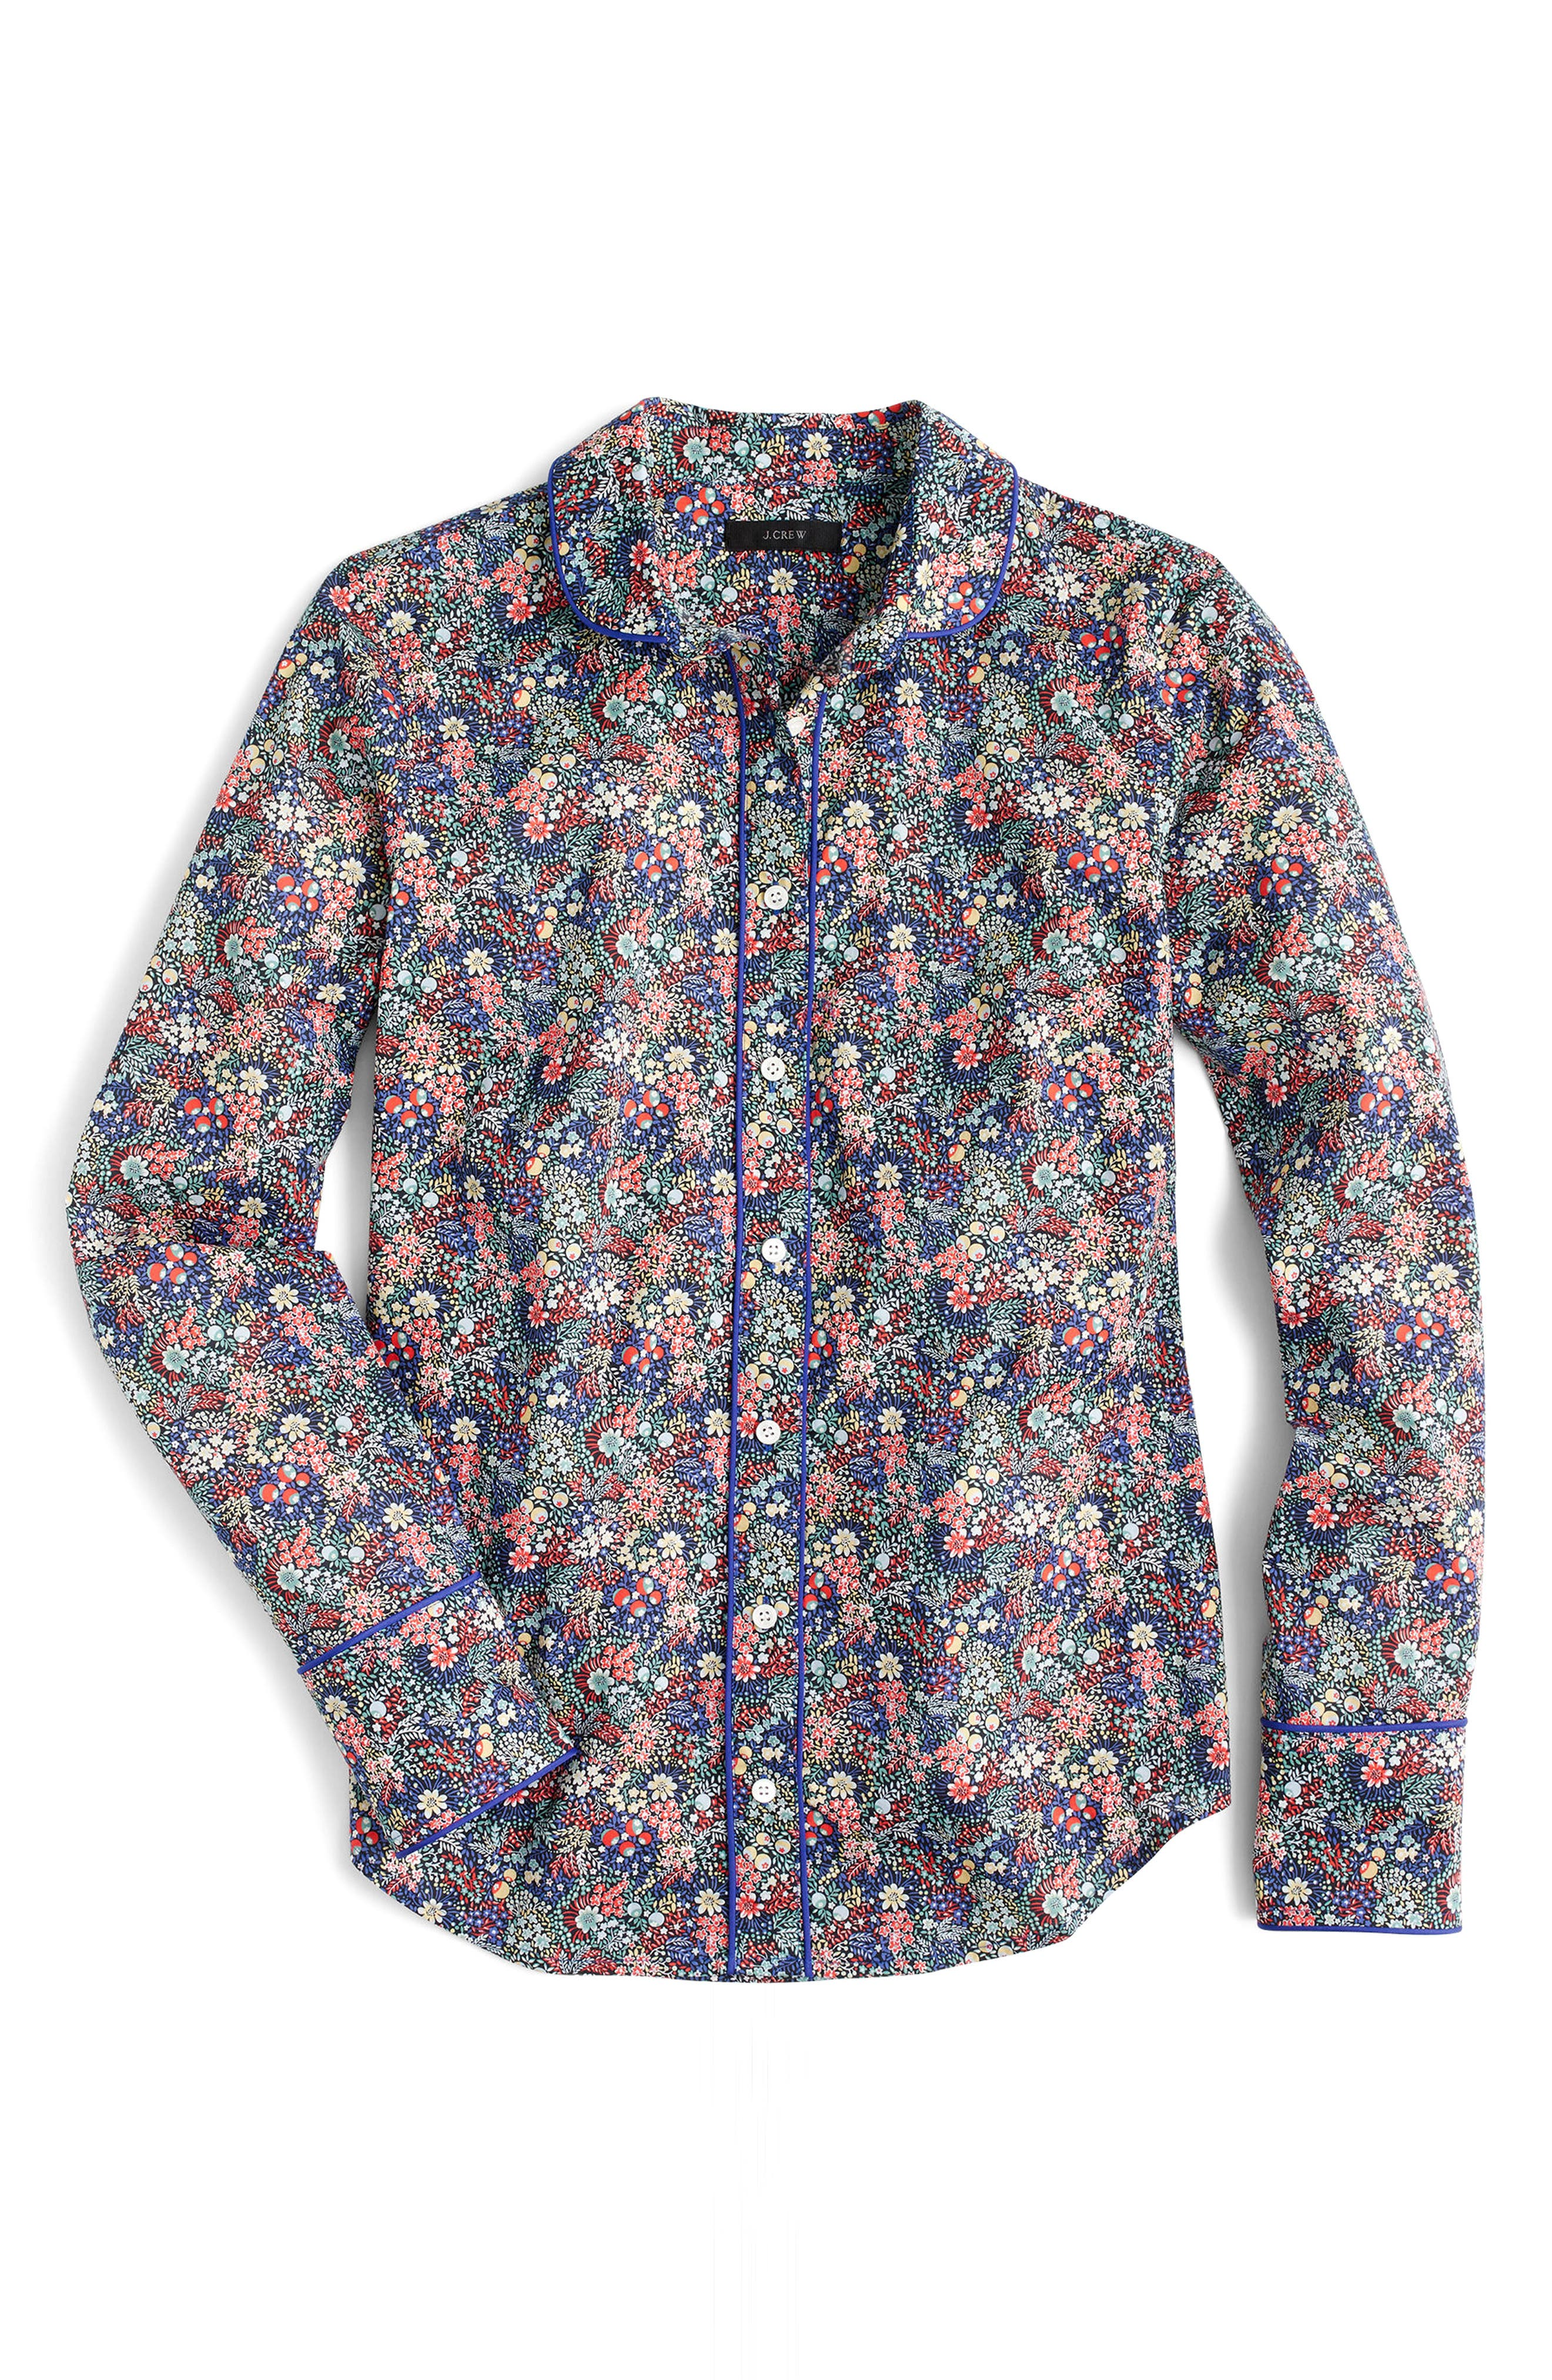 Club Collar Perfect Shirt,                             Alternate thumbnail 2, color,                             400